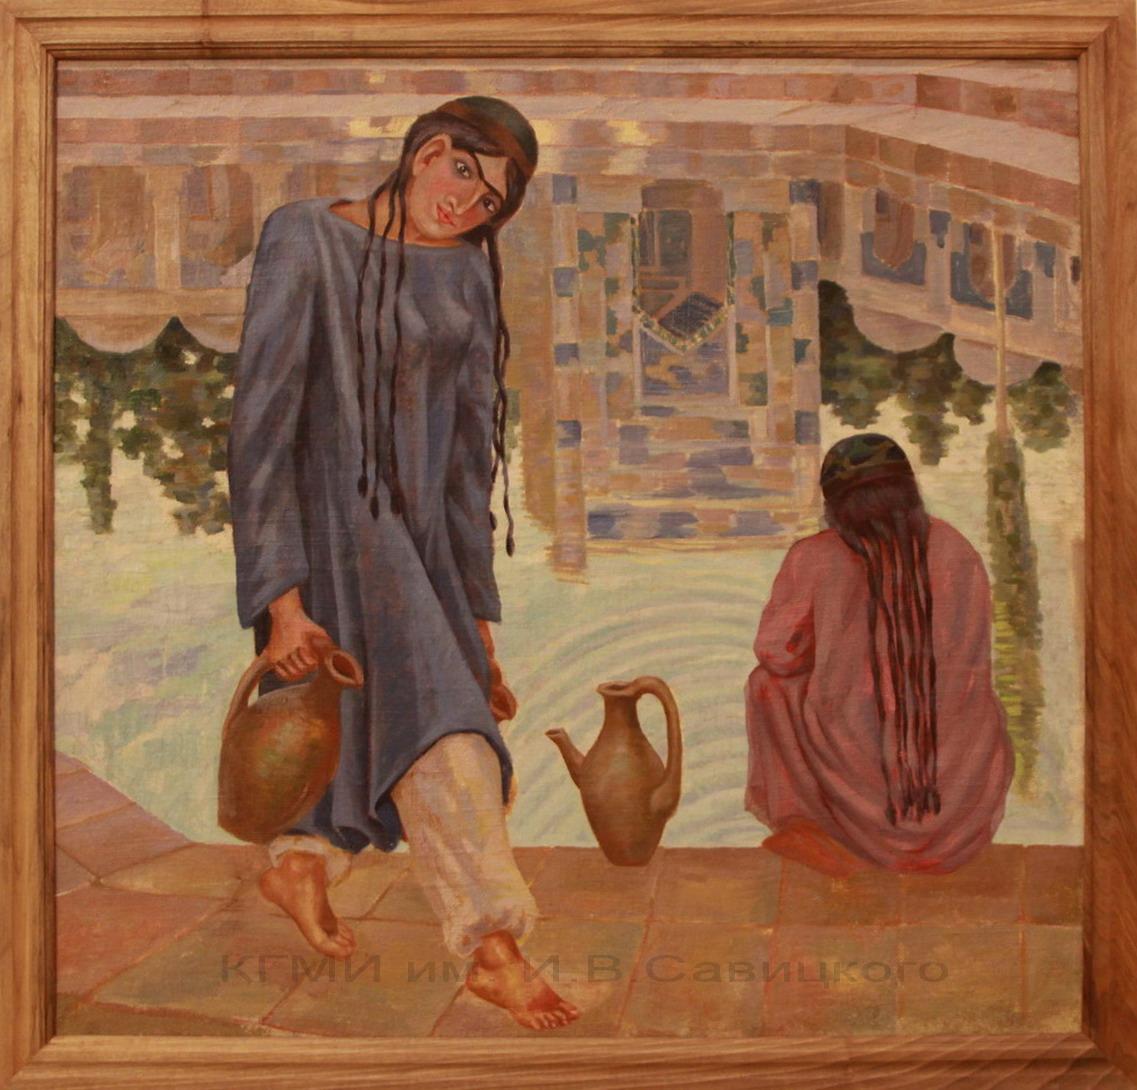 Карахан Николай. (1900-1970). Девушка у хауза. 1-я половина 20 века